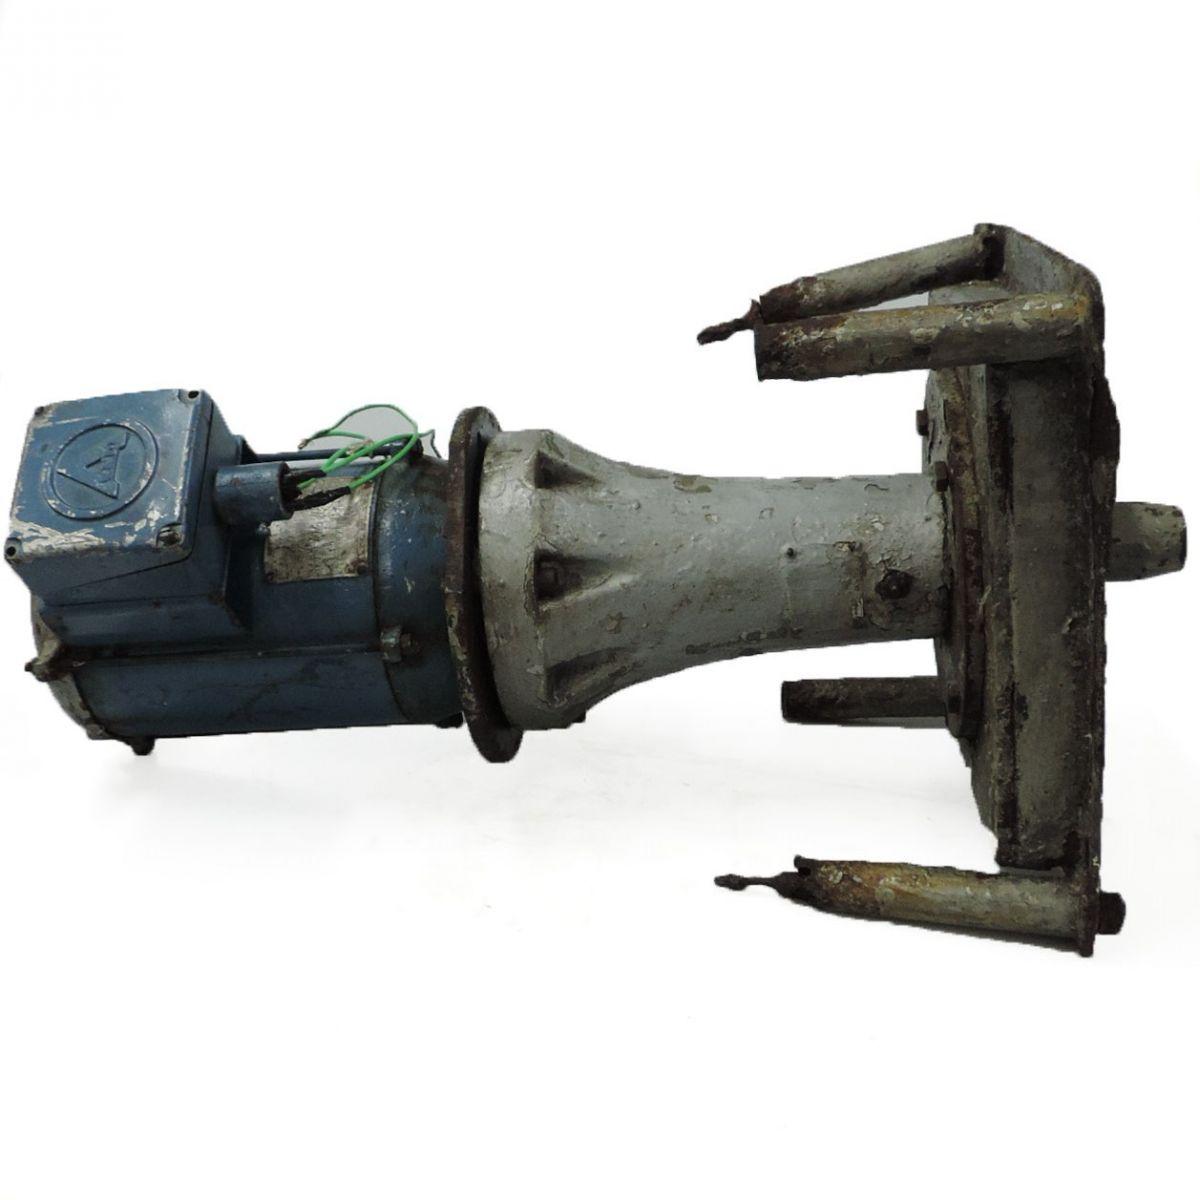 Batedor Com Acoplamento F10 - 0,5 HP 1110 RPM